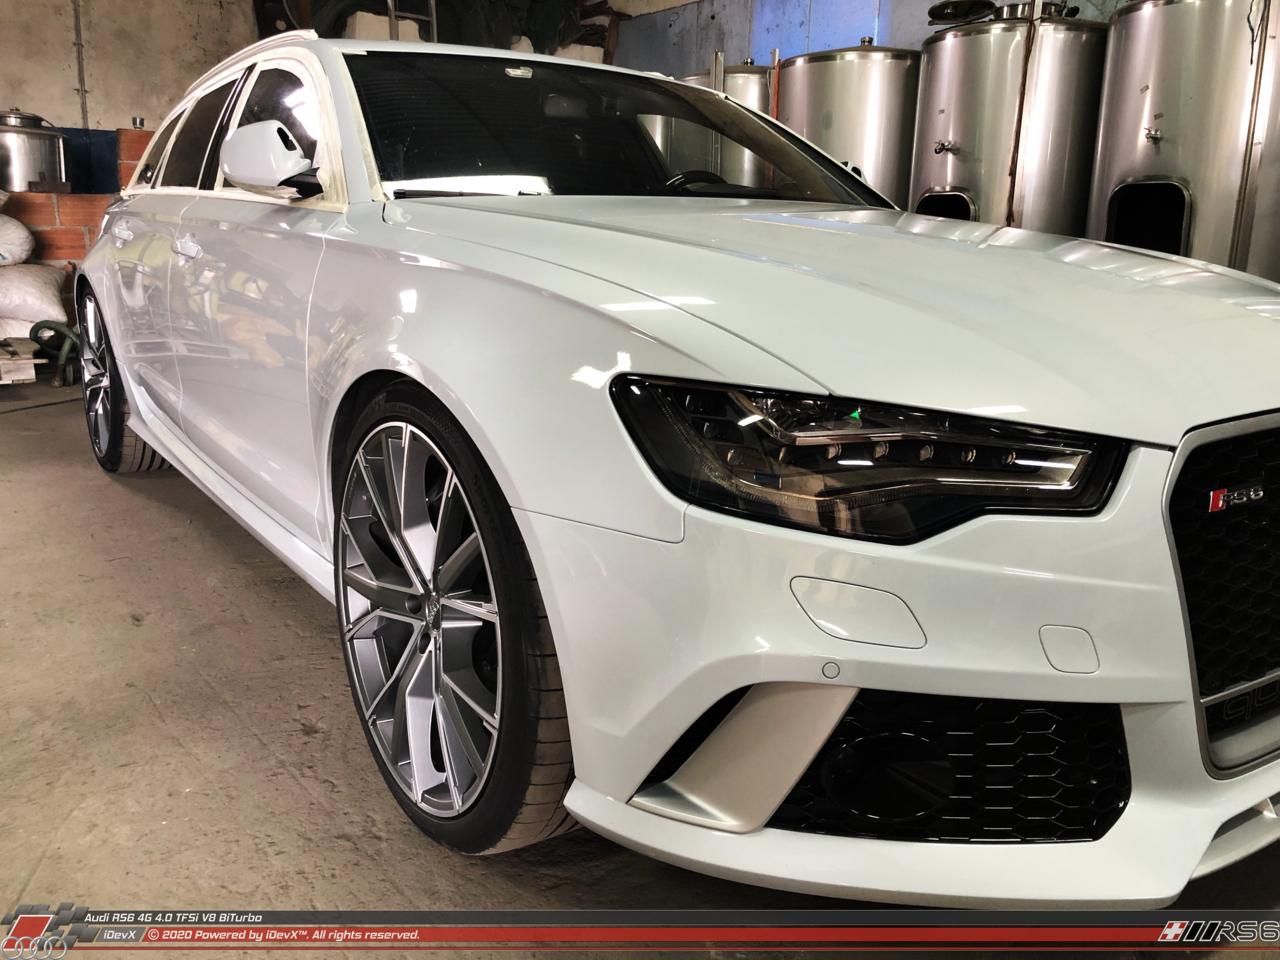 05_08.2019_Audi-RS6_iDevX_023.png